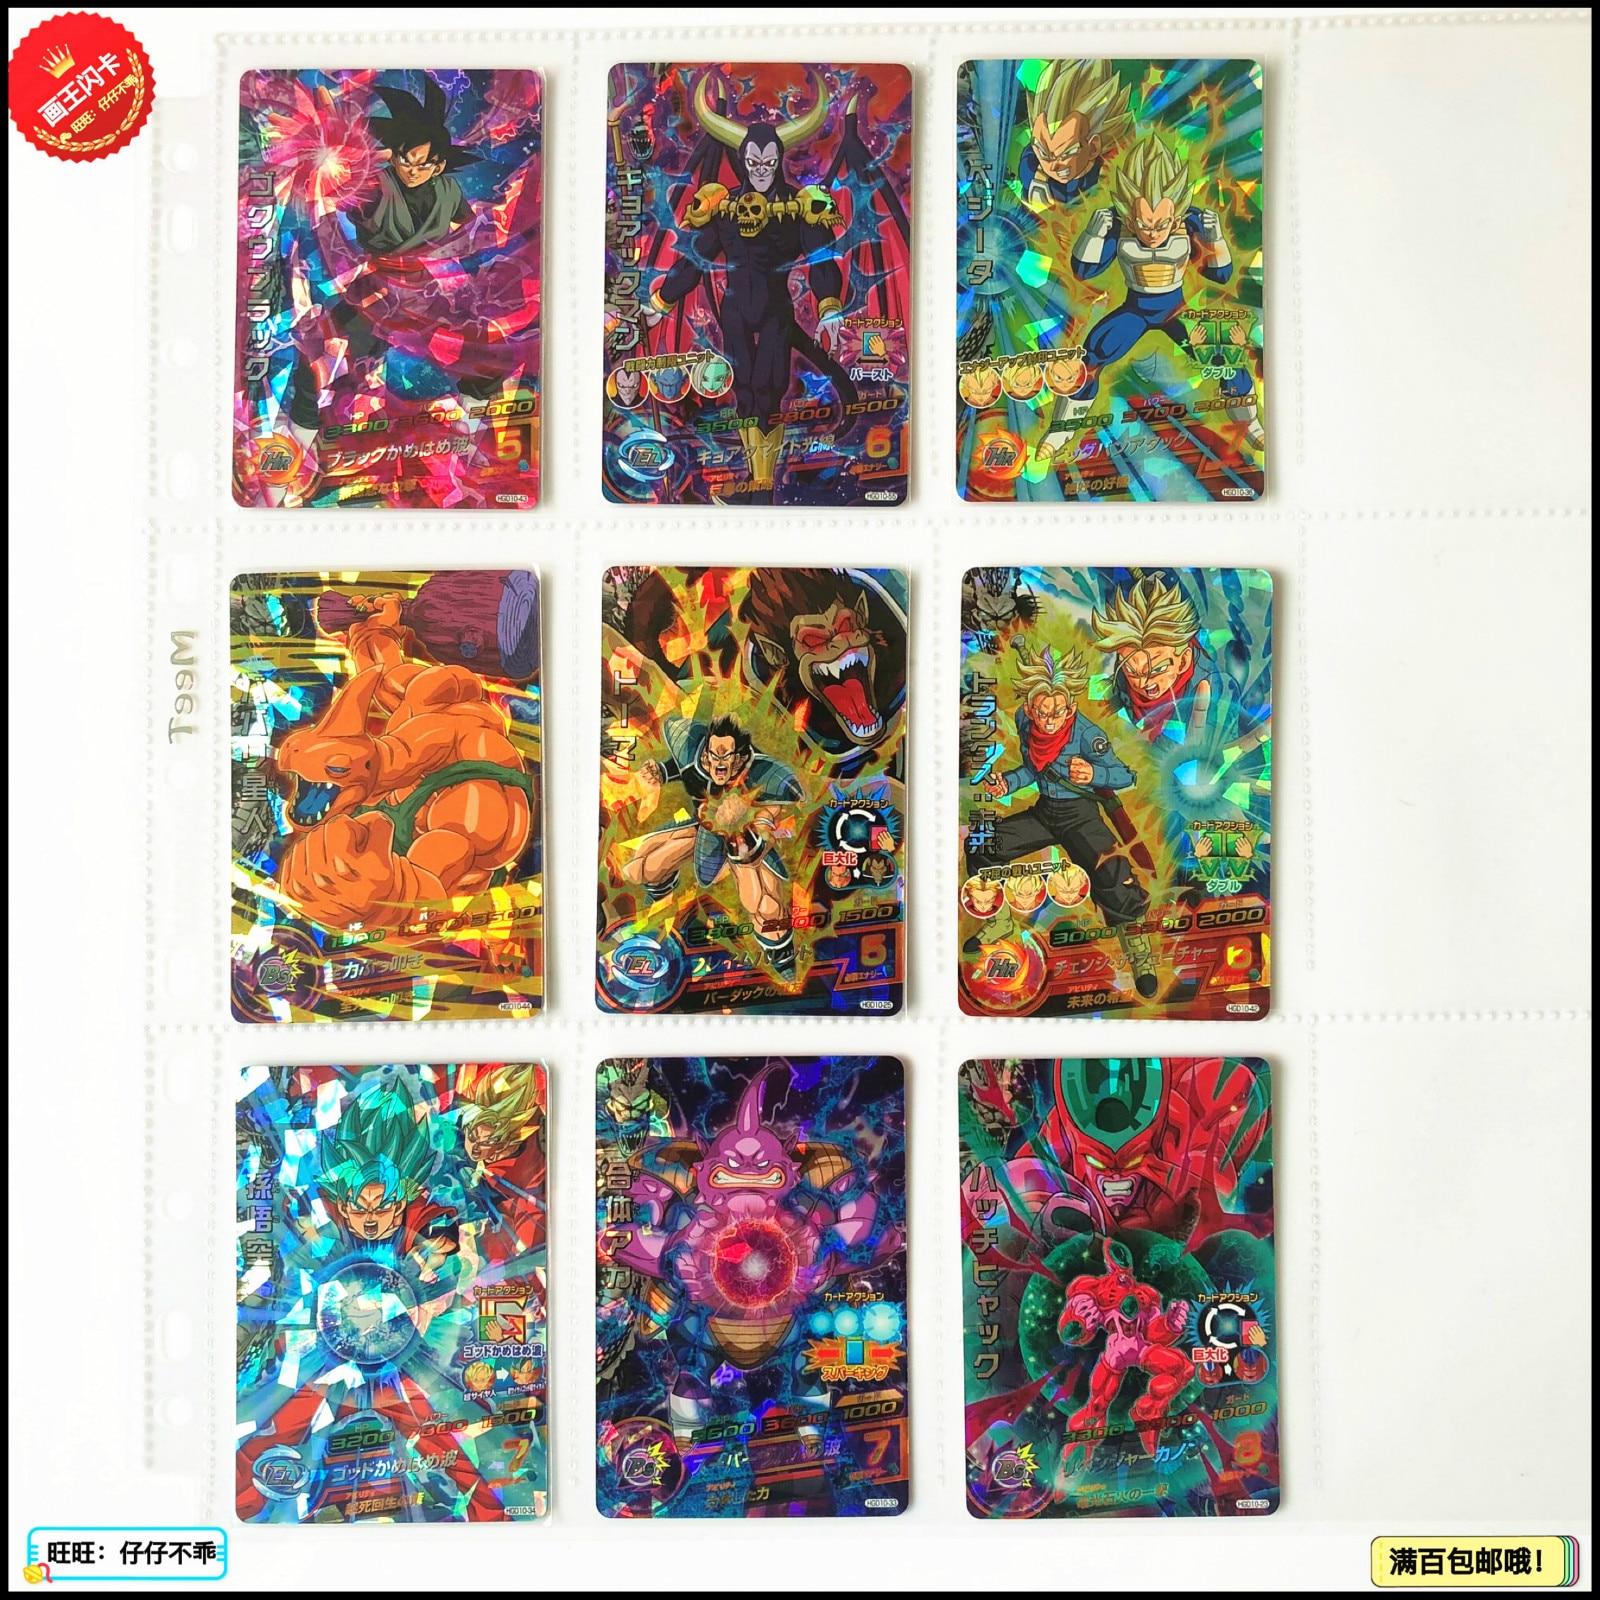 Japan Original Dragon Ball Hero Card SR Flash 3 Stars HGD10 Super Goku Toys Hobbies Collectibles Game Collection Anime Cards